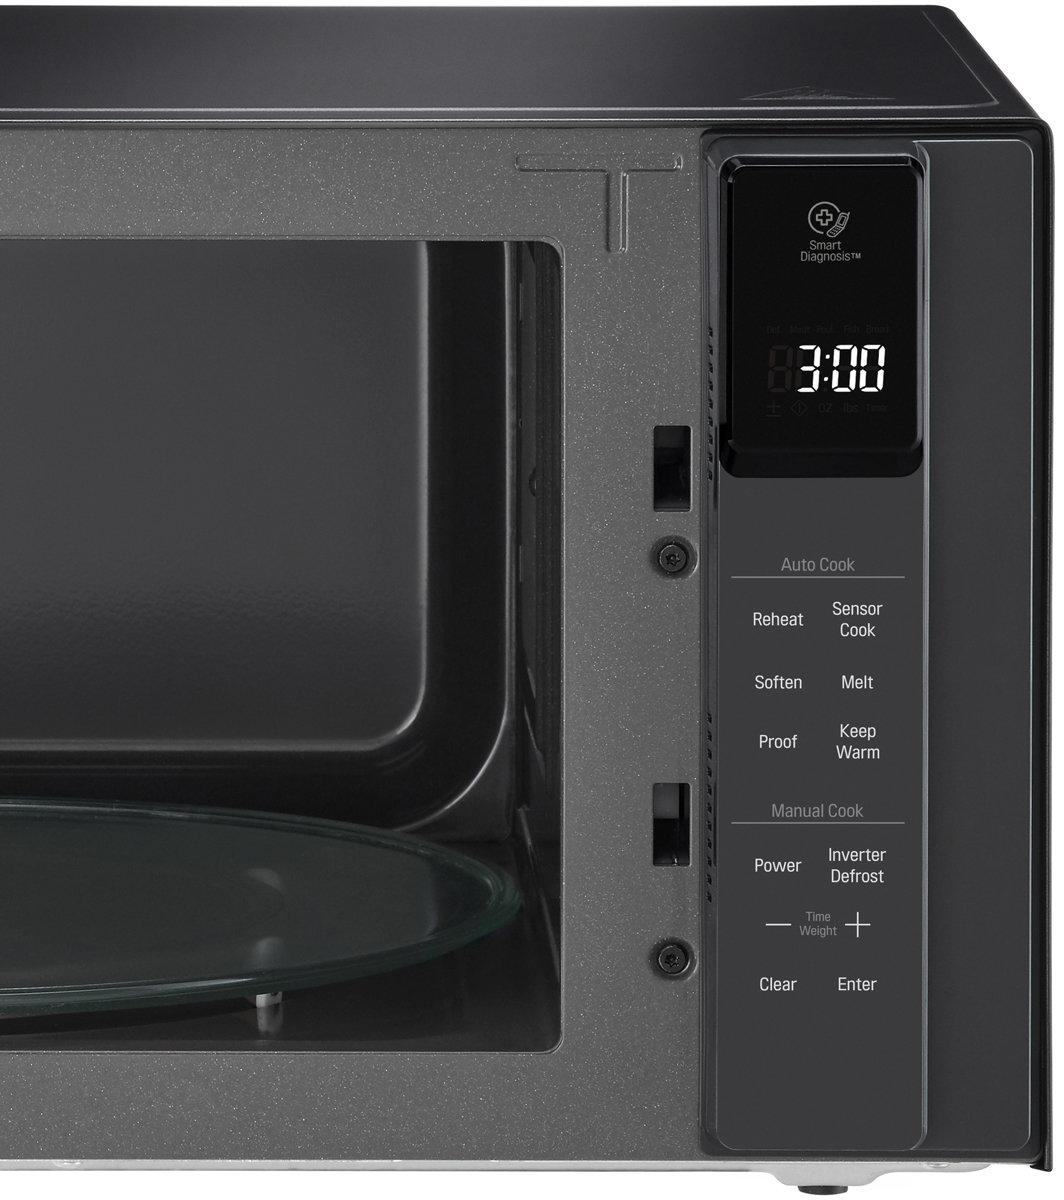 lg ms4296obss 42l neochef smart inverter 1200w black microwave oven